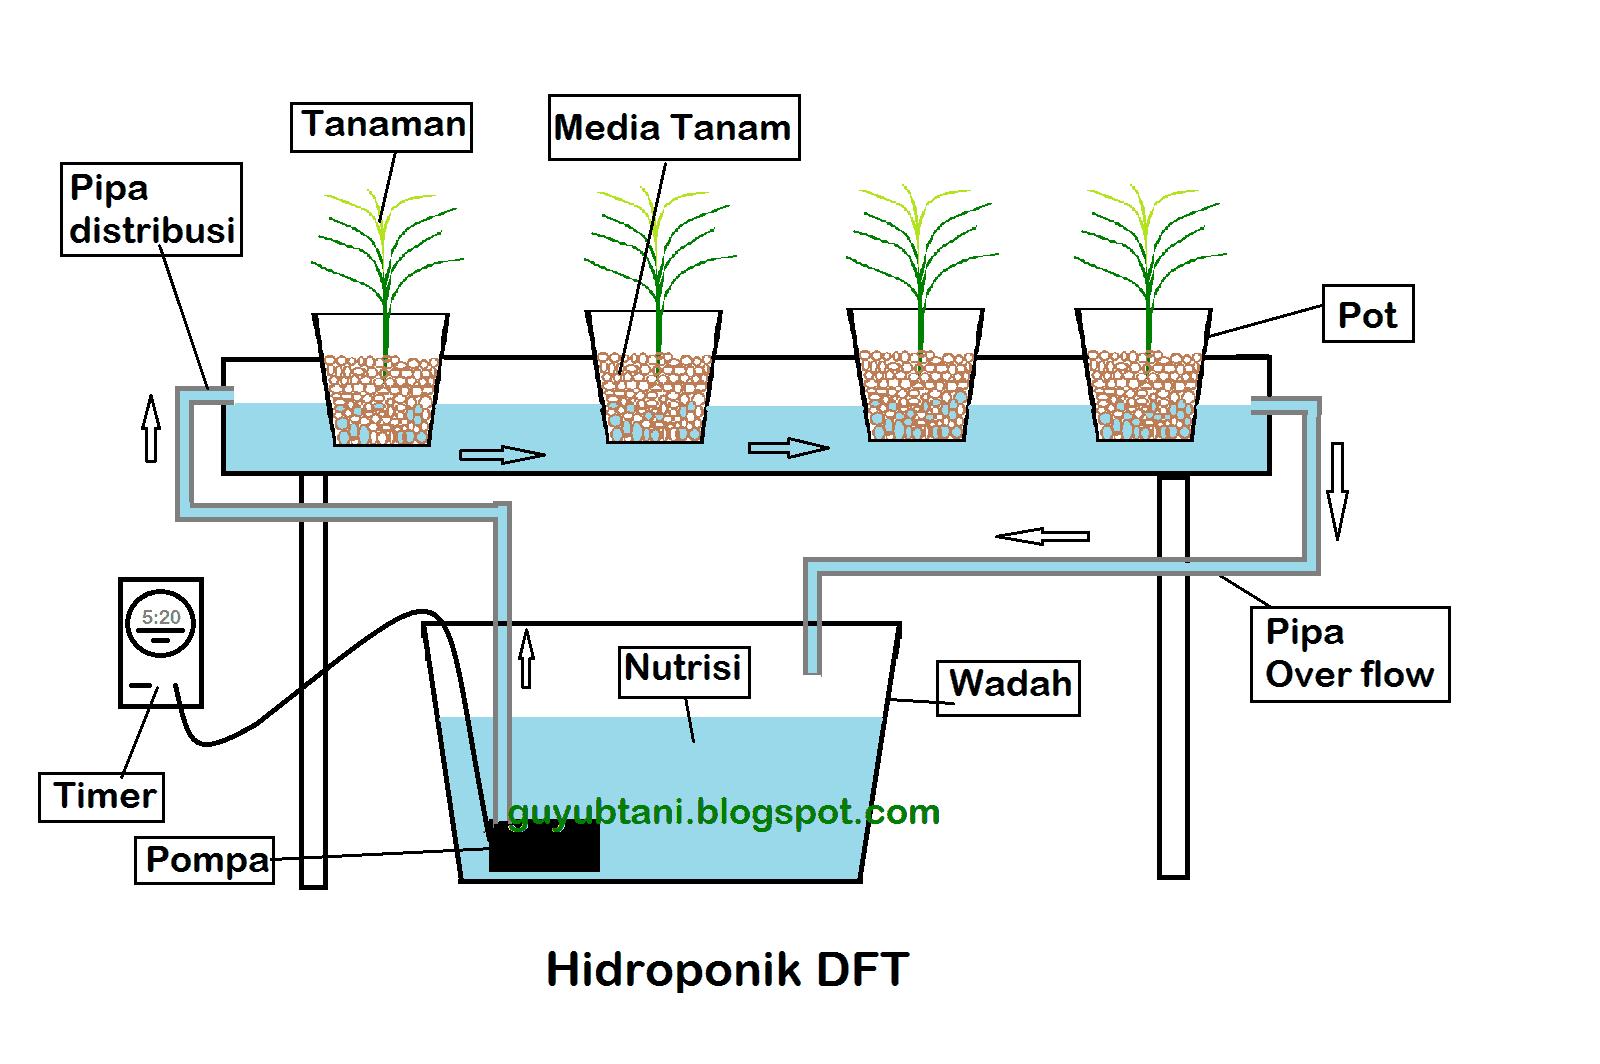 cara menanam hidroponik DFT 2